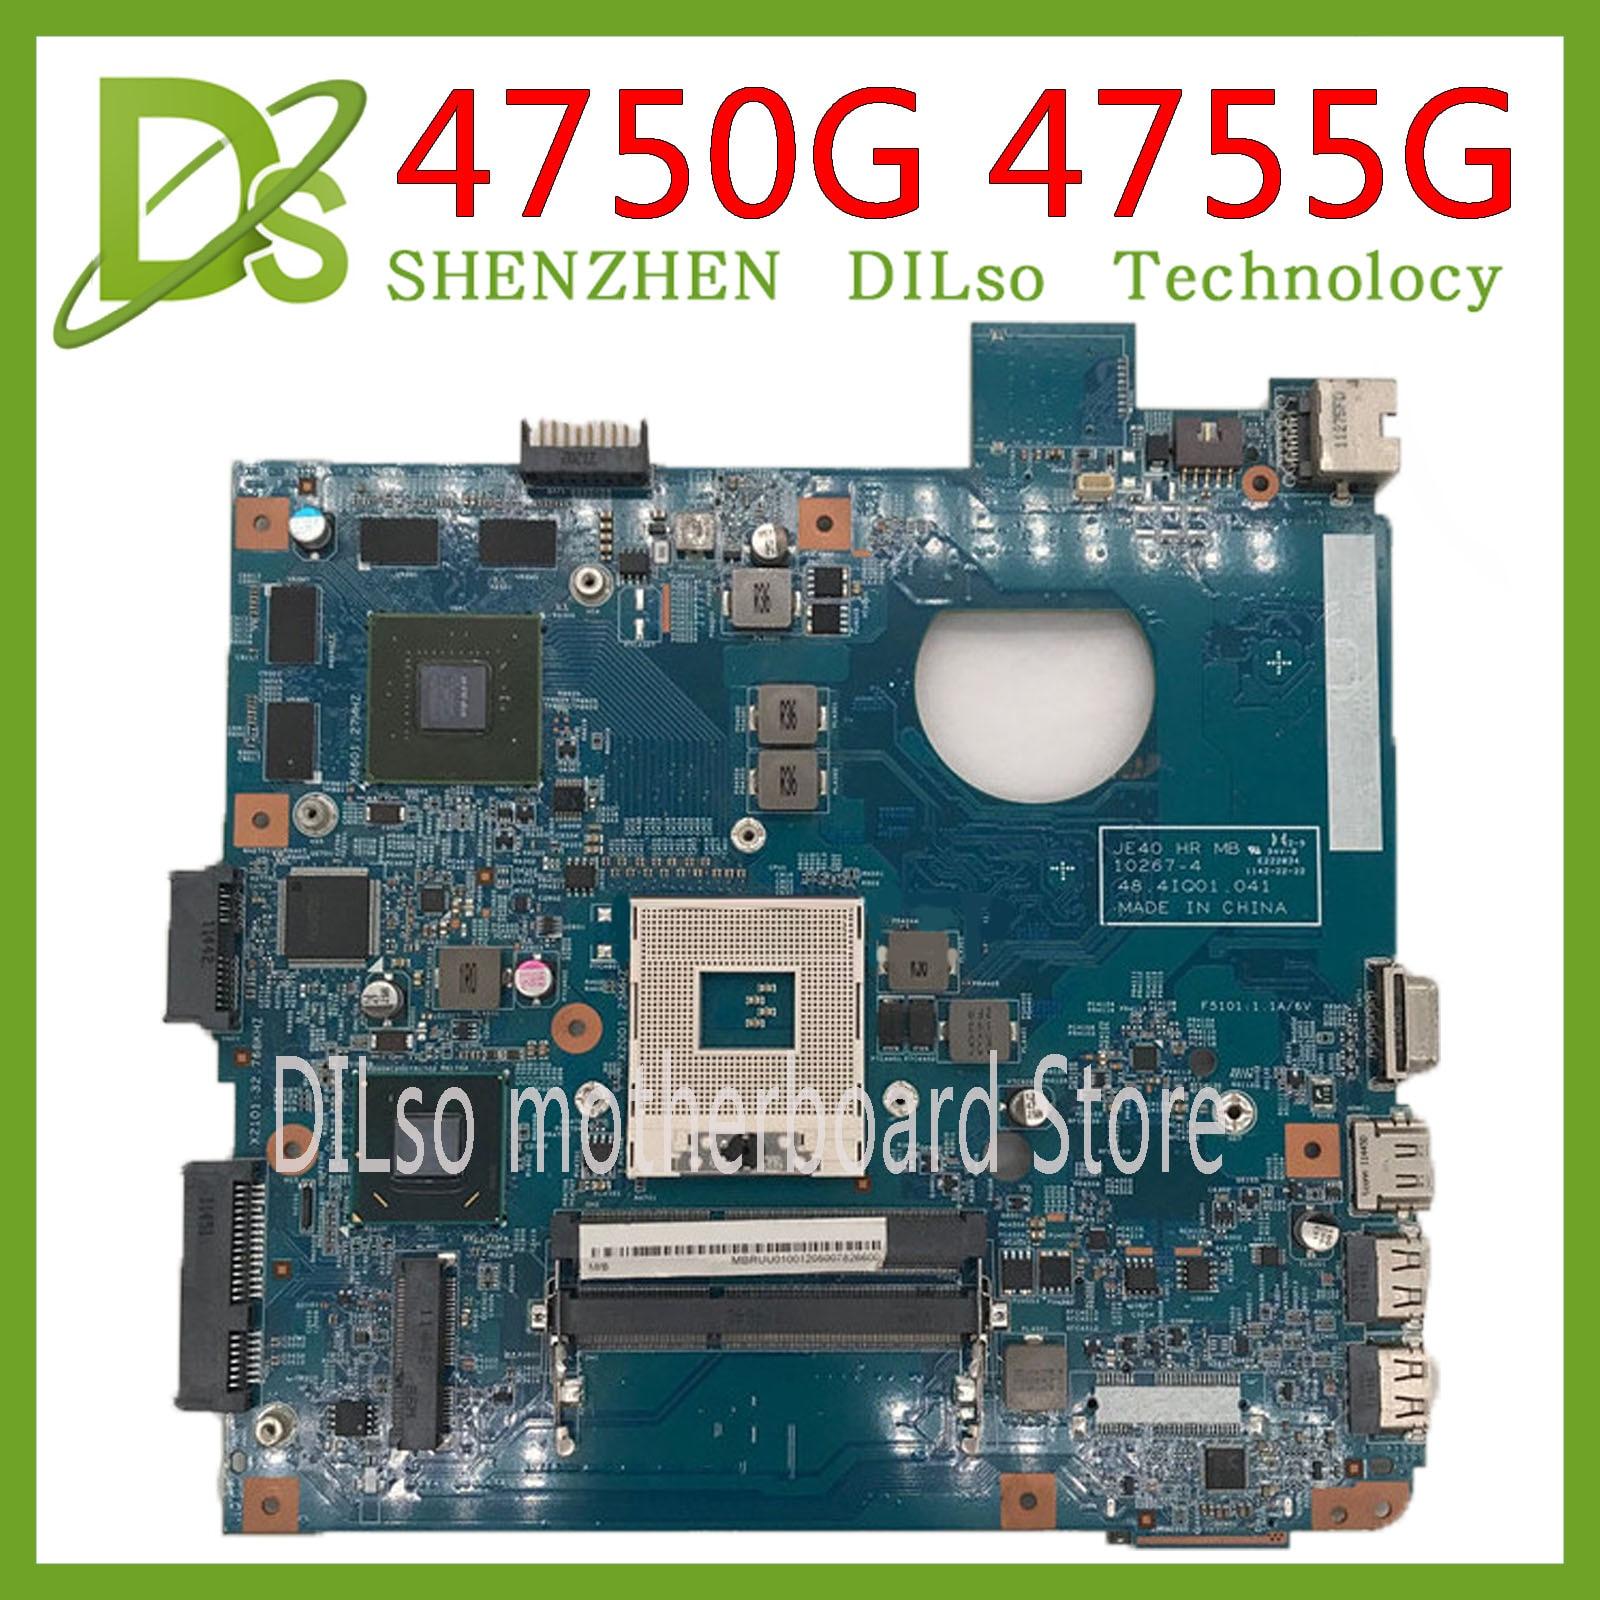 KEFU 4752 motherbaord para Acer aspire 4750G 4752G 4755G placa base 10267-4 HM65 DDR3 100% prueba original mianboard